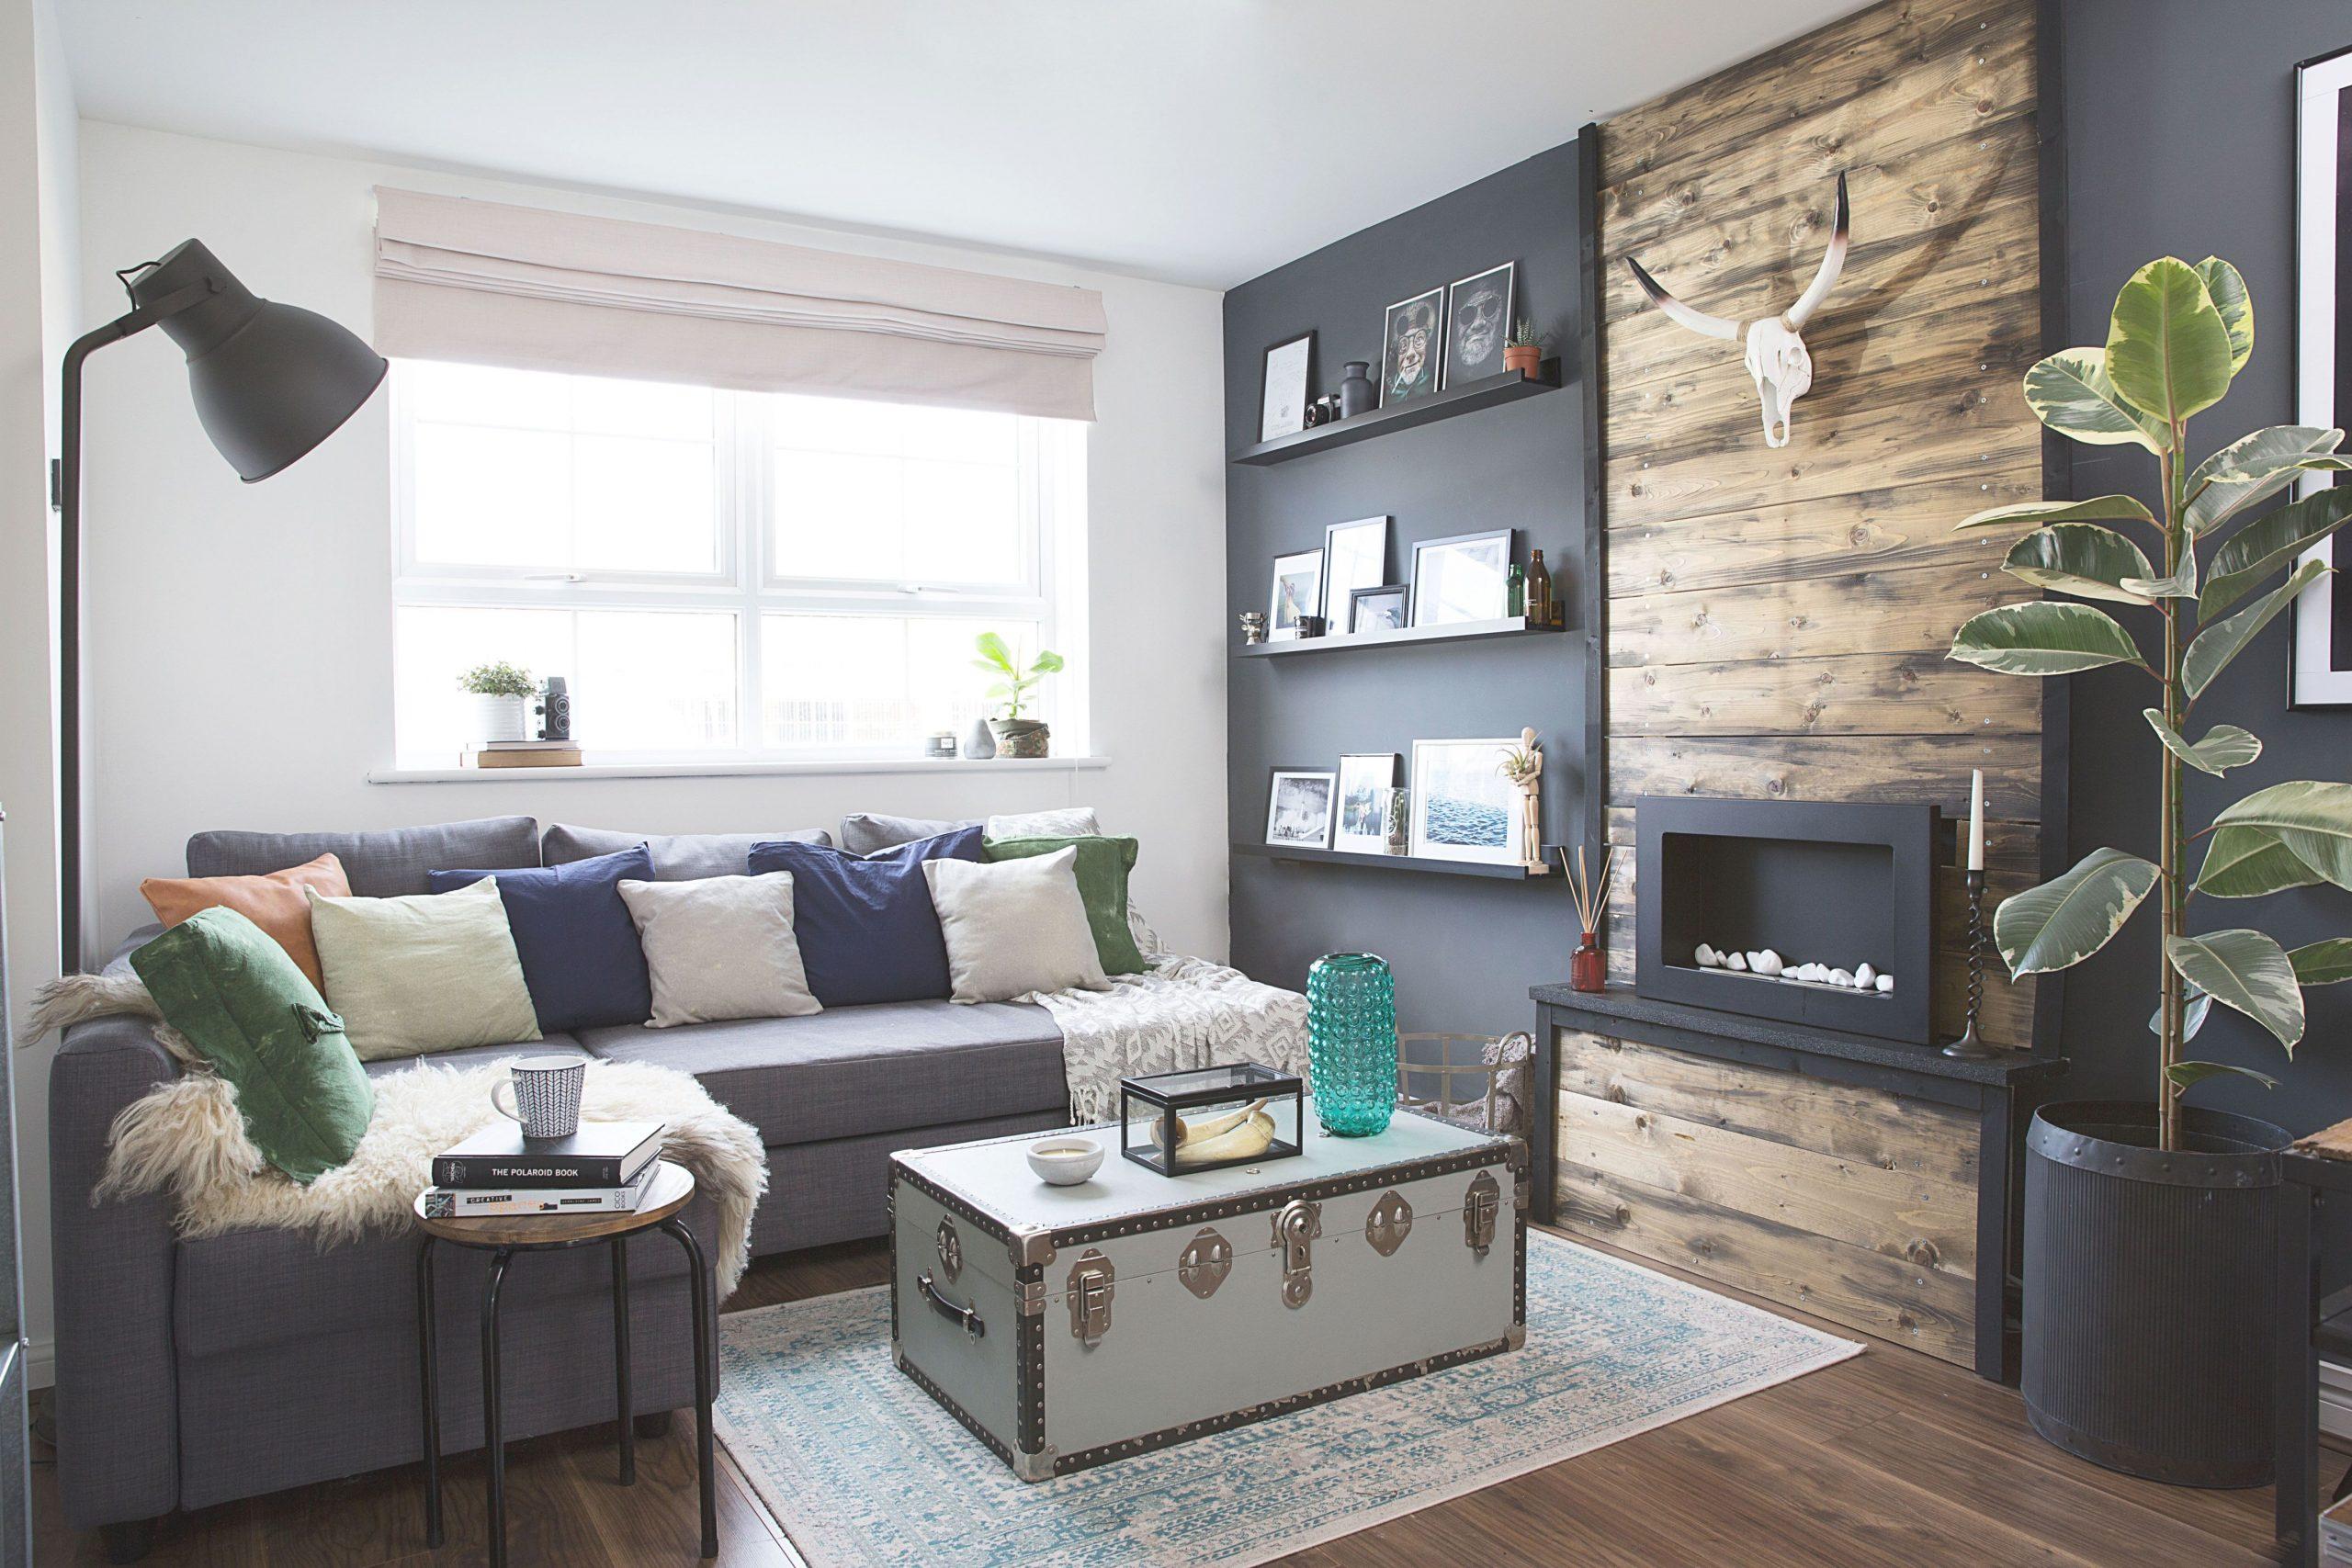 50 Inspirational Living Room Ideas – Living Room Design with regard to Sample Living Room Decor